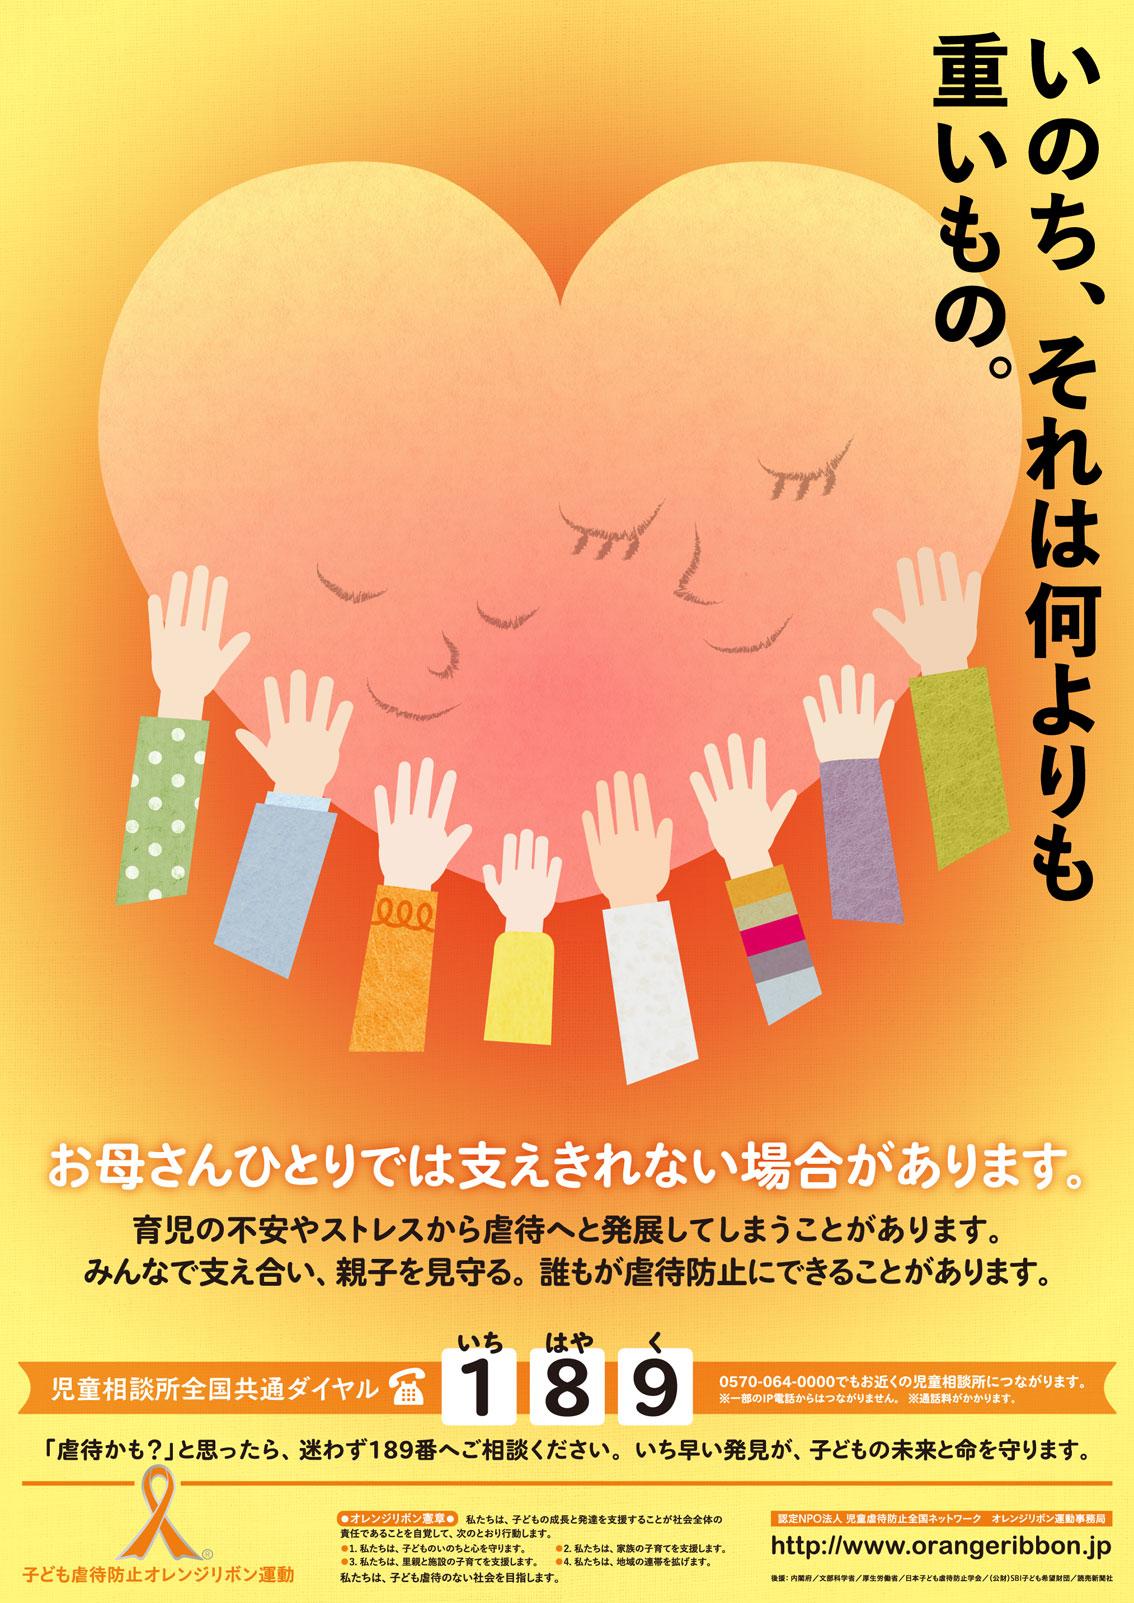 http://www.orangeribbon.jp/info/npo/contest/image/2015contest_tokubetsu_tokyo.jpg